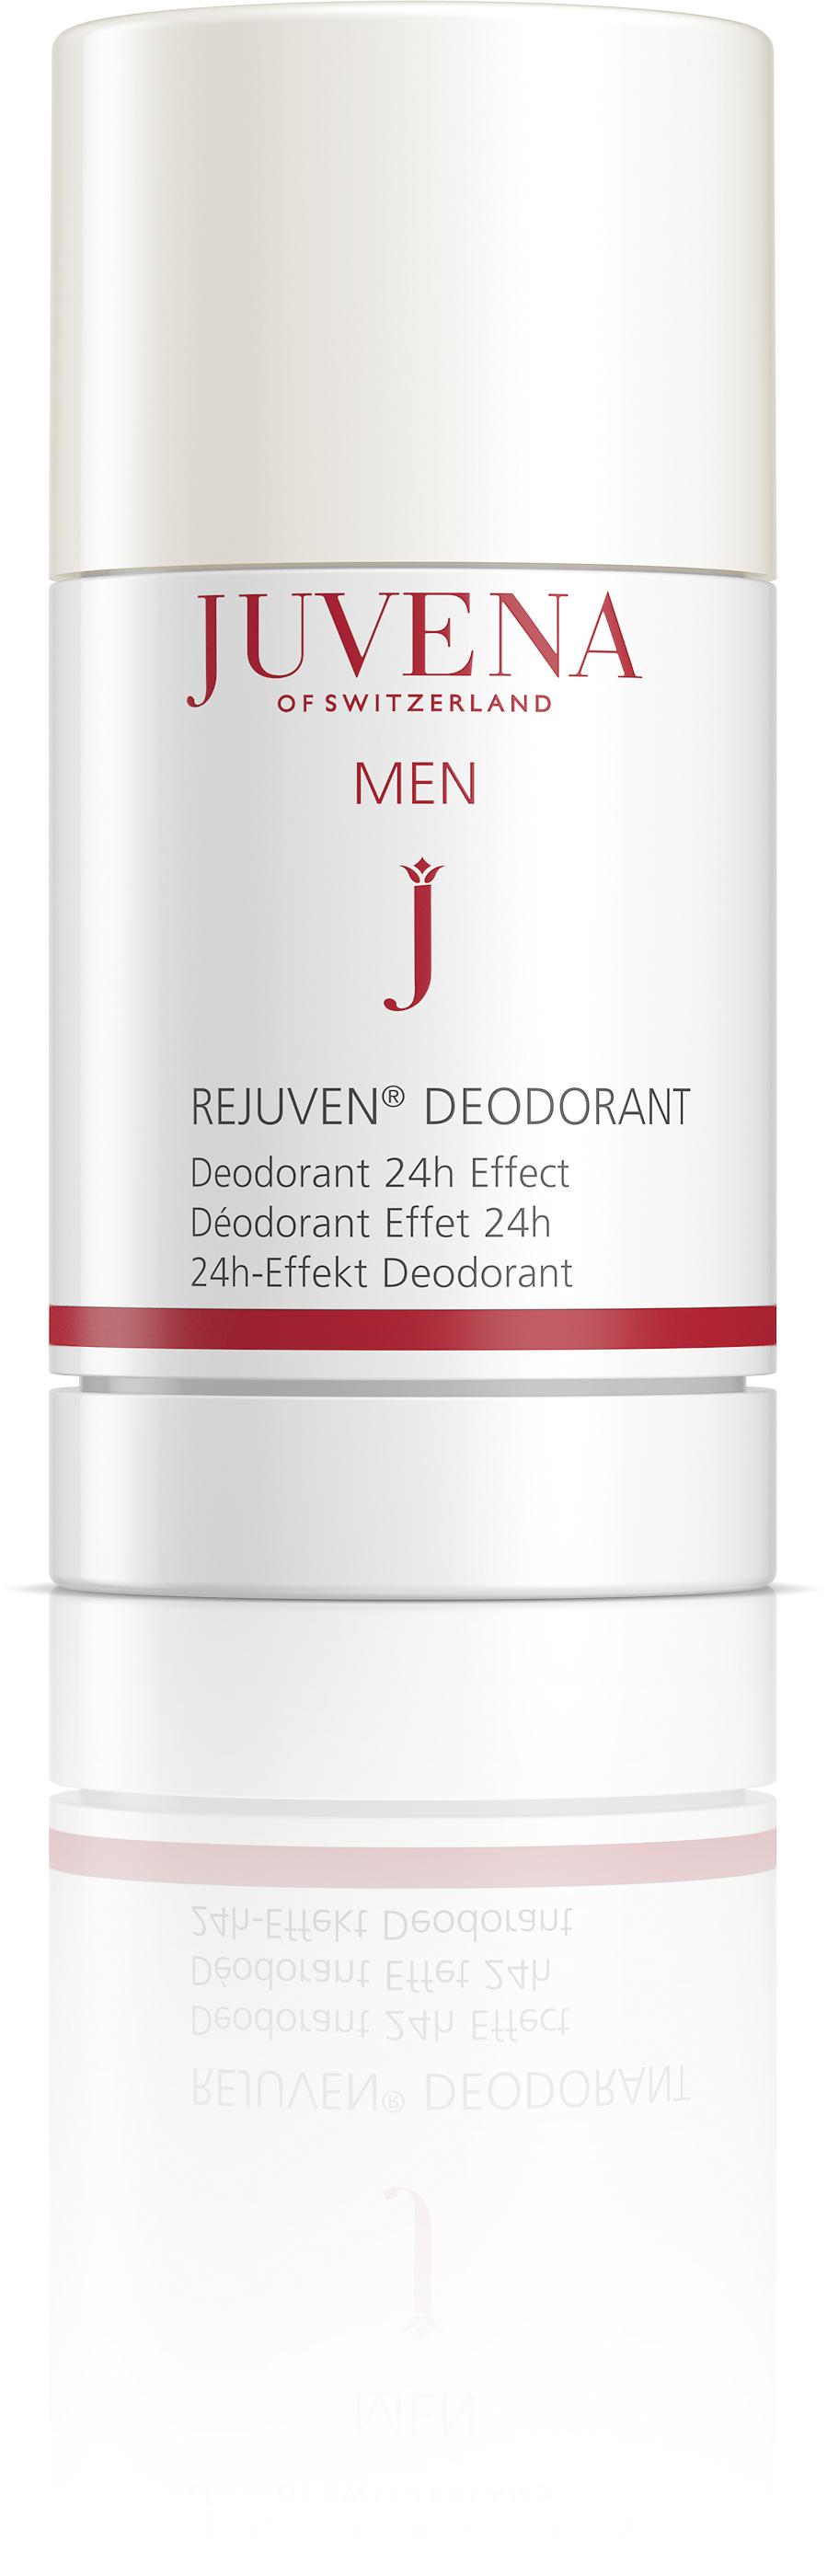 Juvena Rejuven Men Deodorant 24H Effect 75 ml